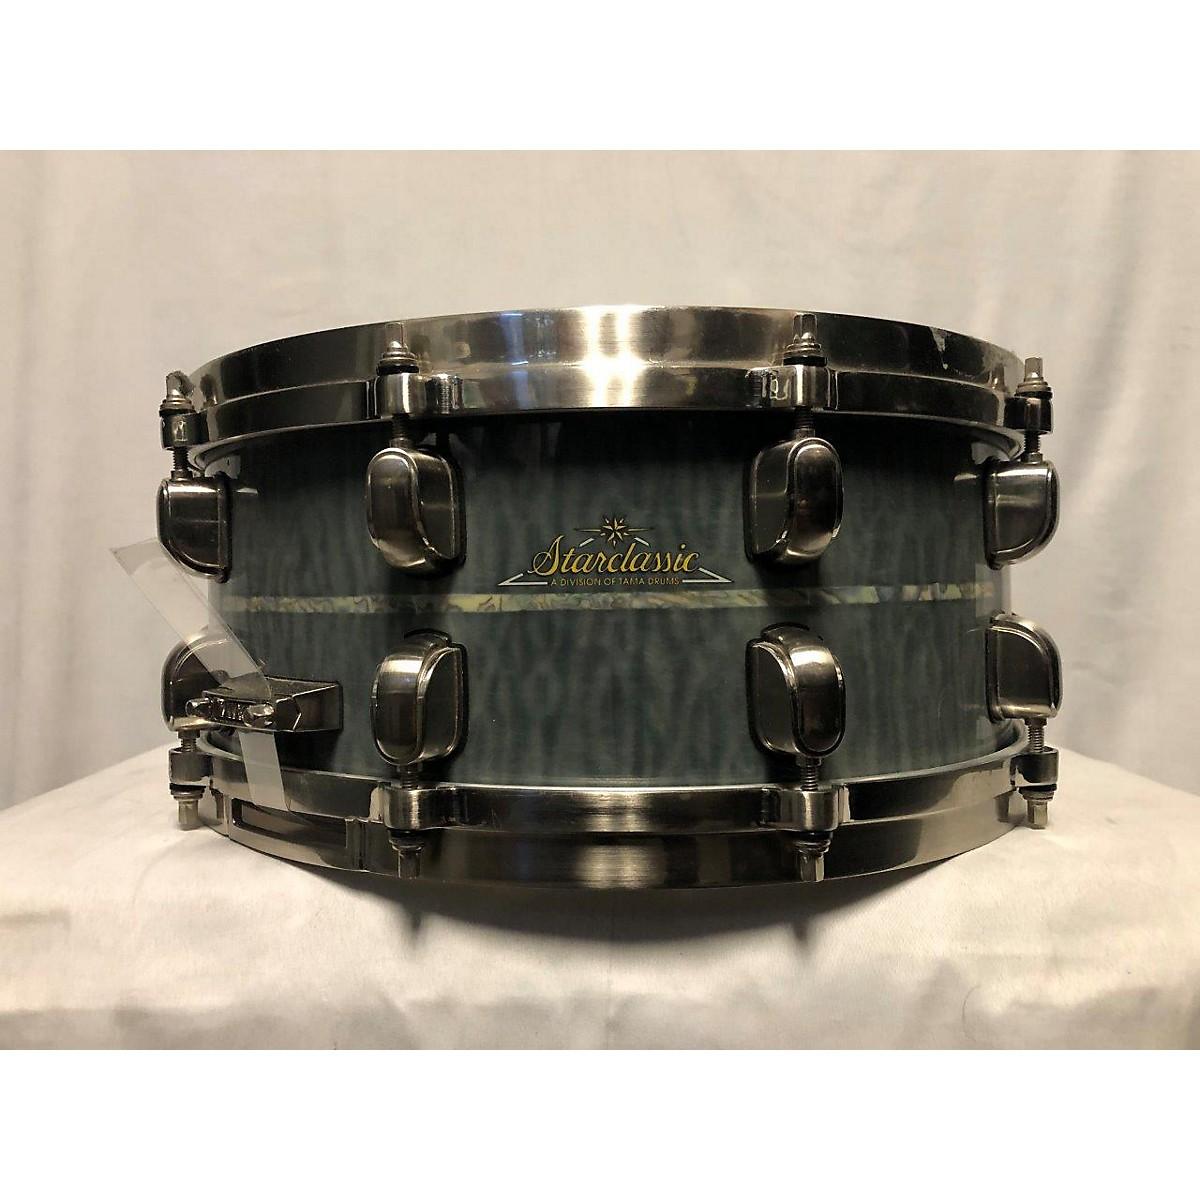 TAMA 5.5X14 Starclassic Exotix Drum